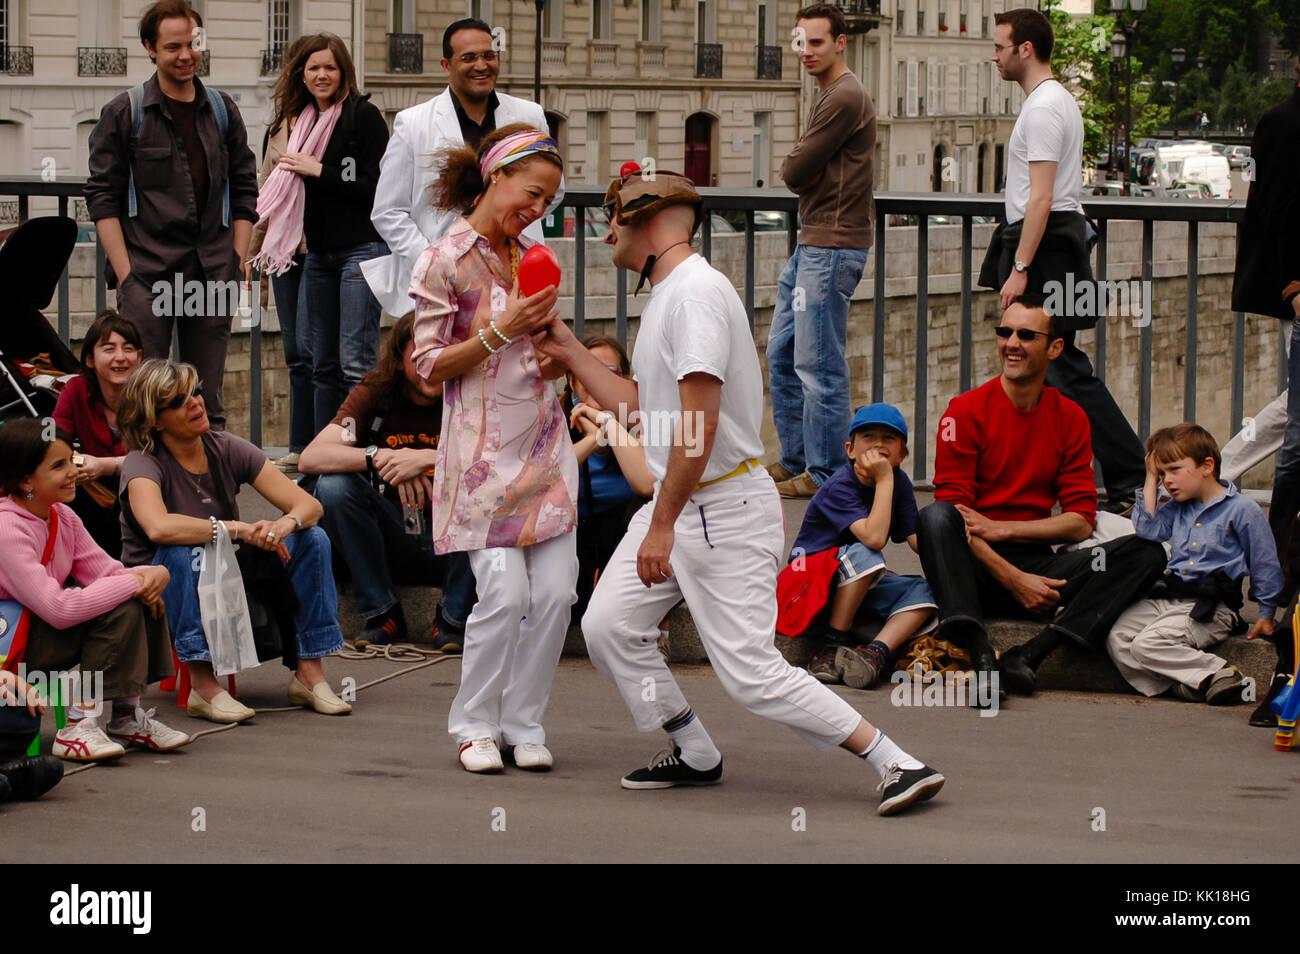 street-performer-entertain-tourists-on-t